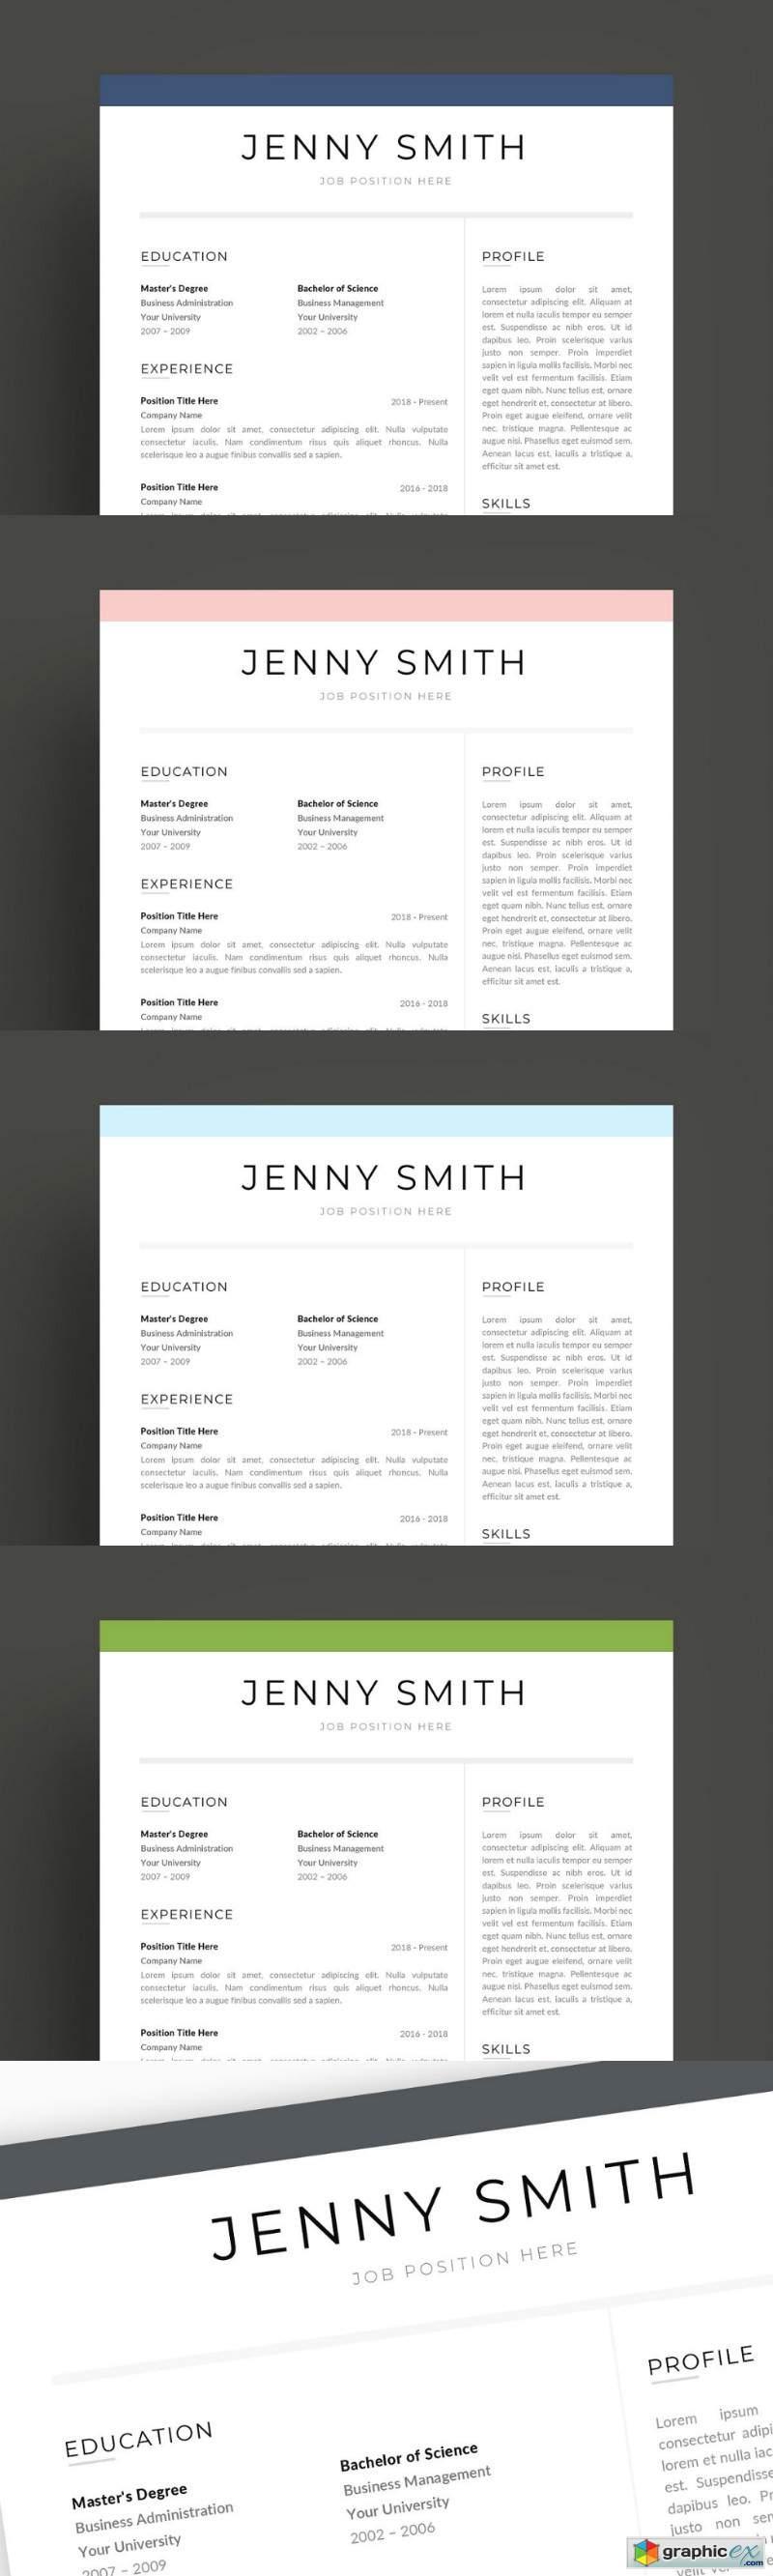 Resume Template Word Modern Clean CV 2684483